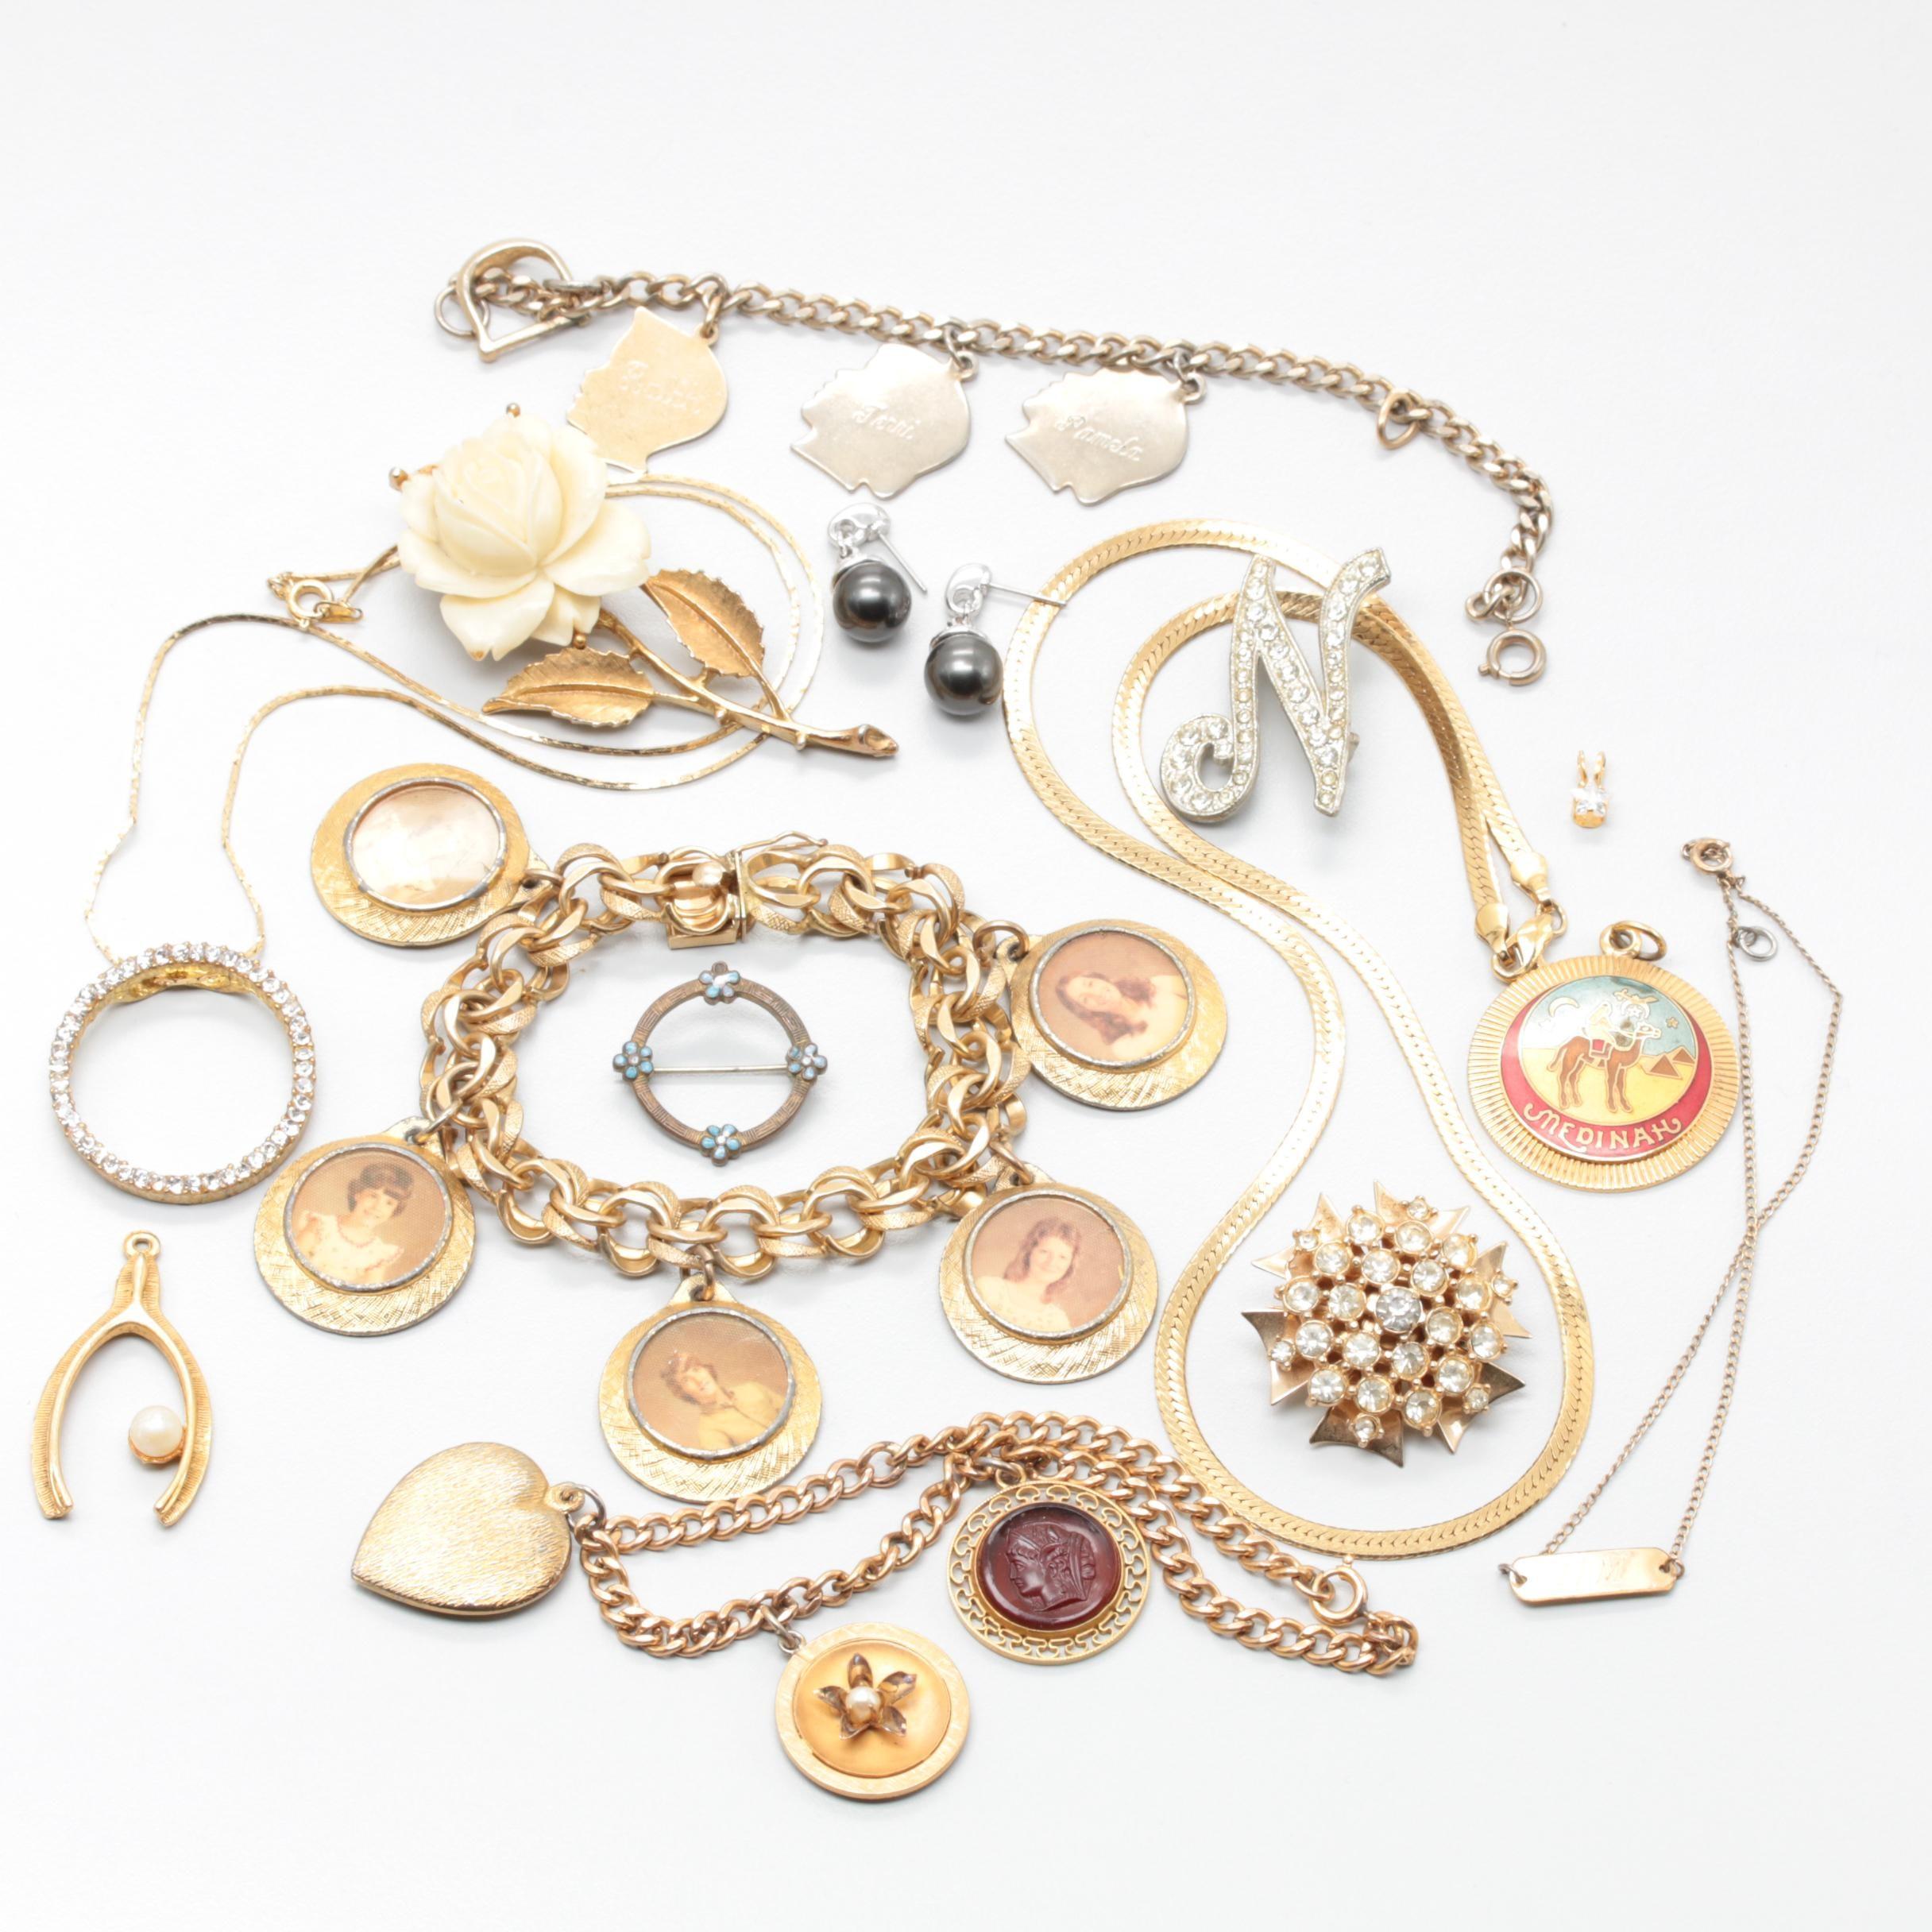 Gold Tone Jewelry Assortment Including Foilbacks, Enamel, and Plastic